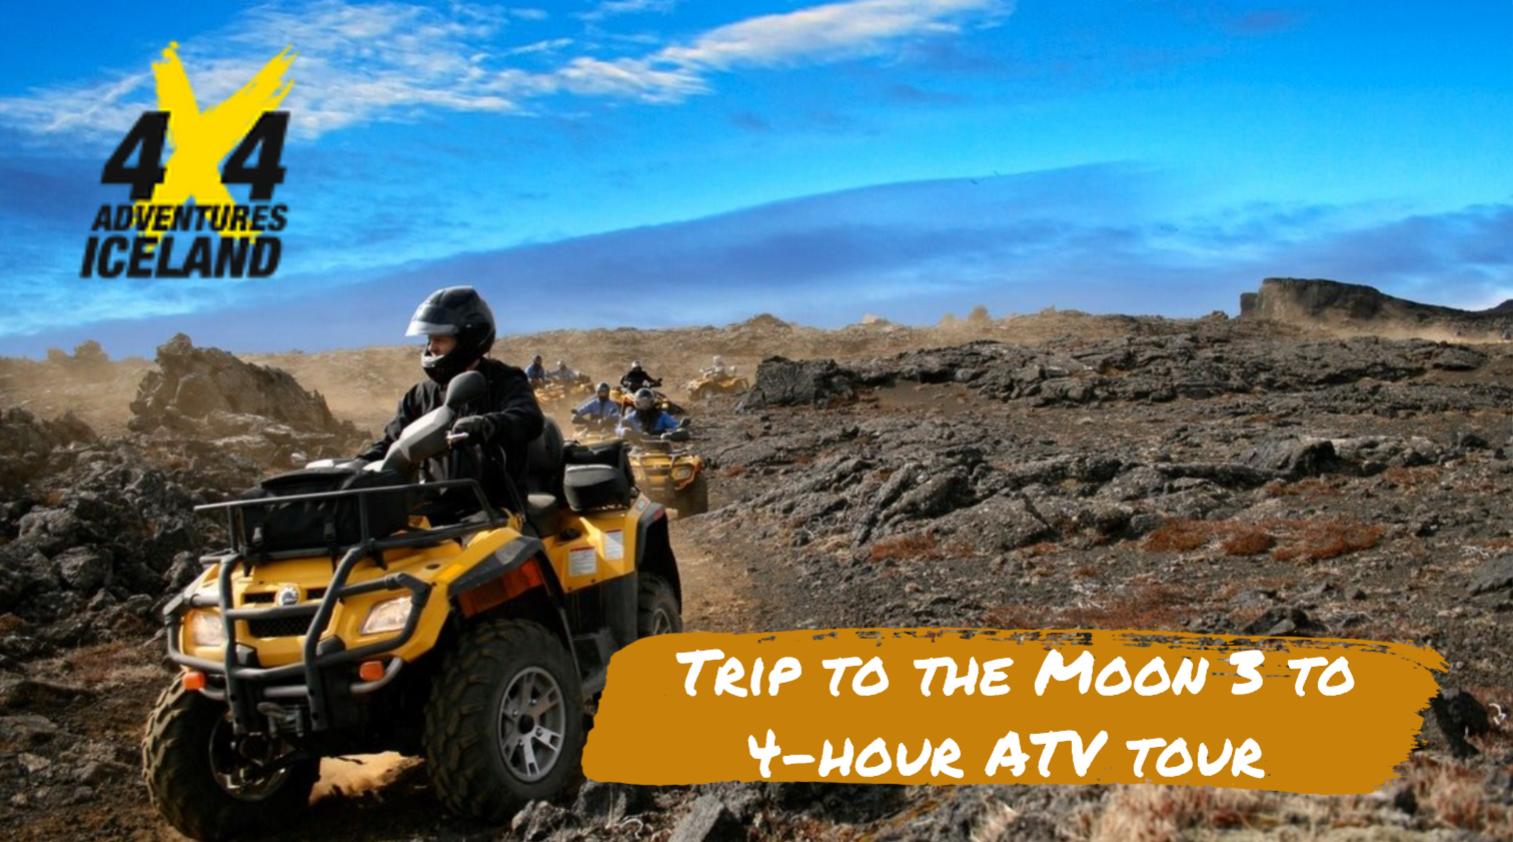 Trip to the Moon 3 to 4-hour ATV tour